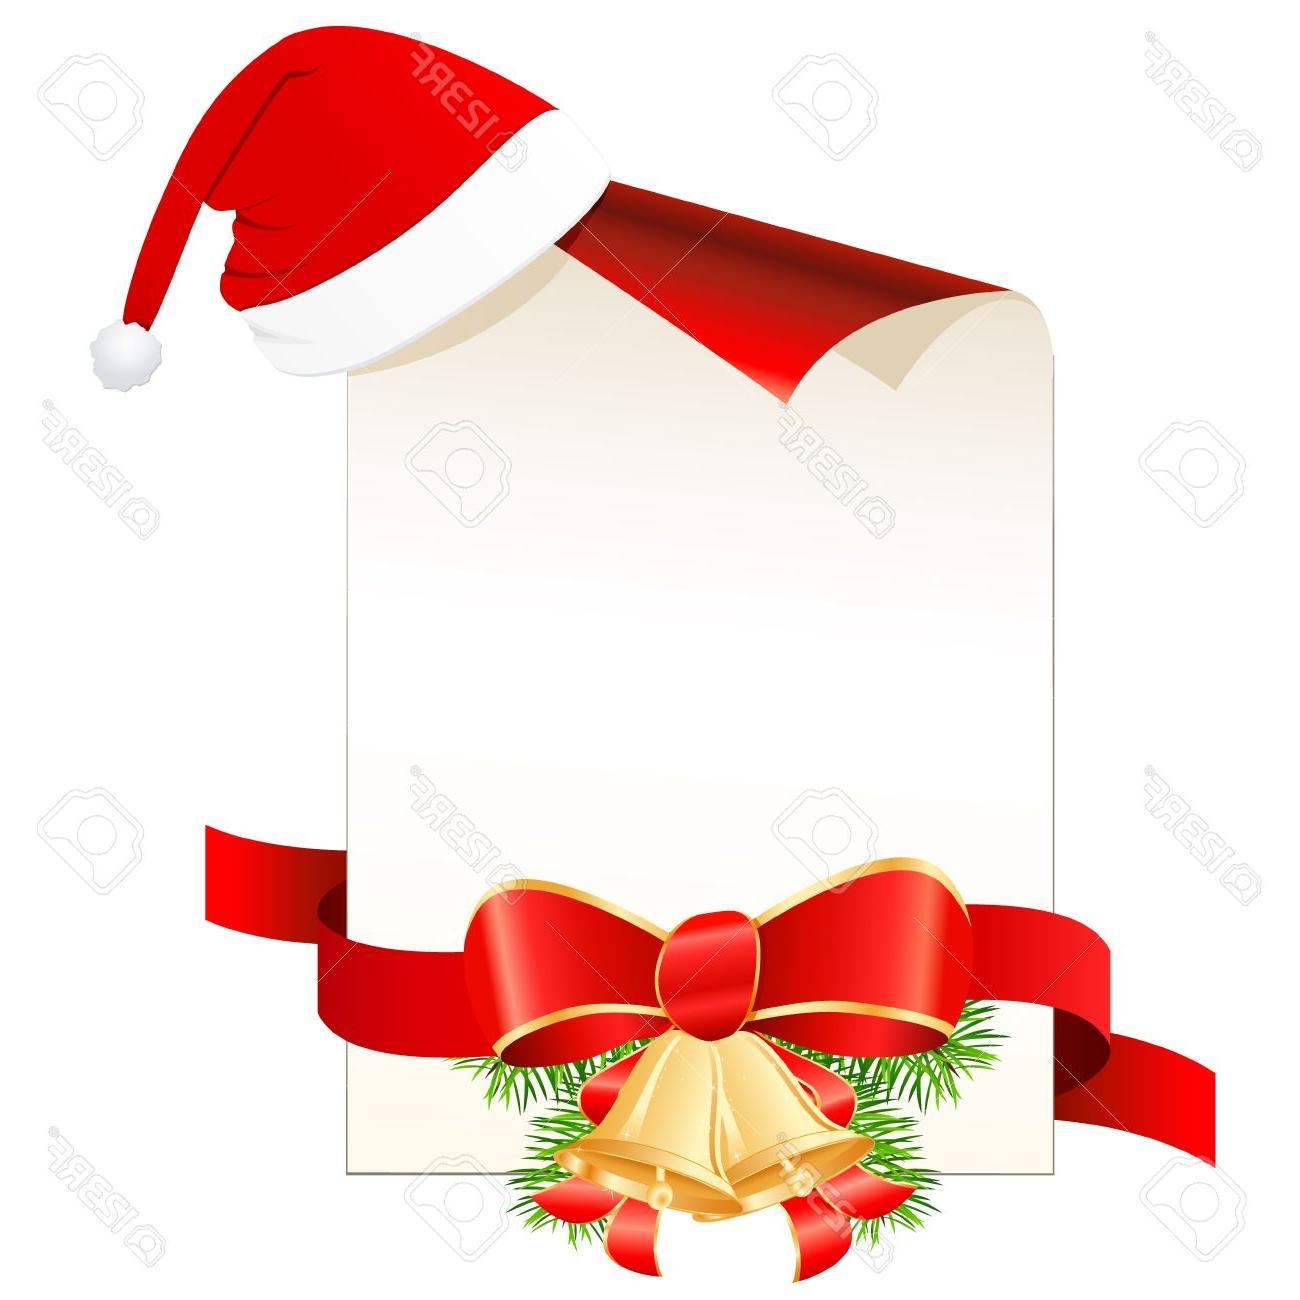 Unique Christmas List Clip Art Vector Image » Free Vector.